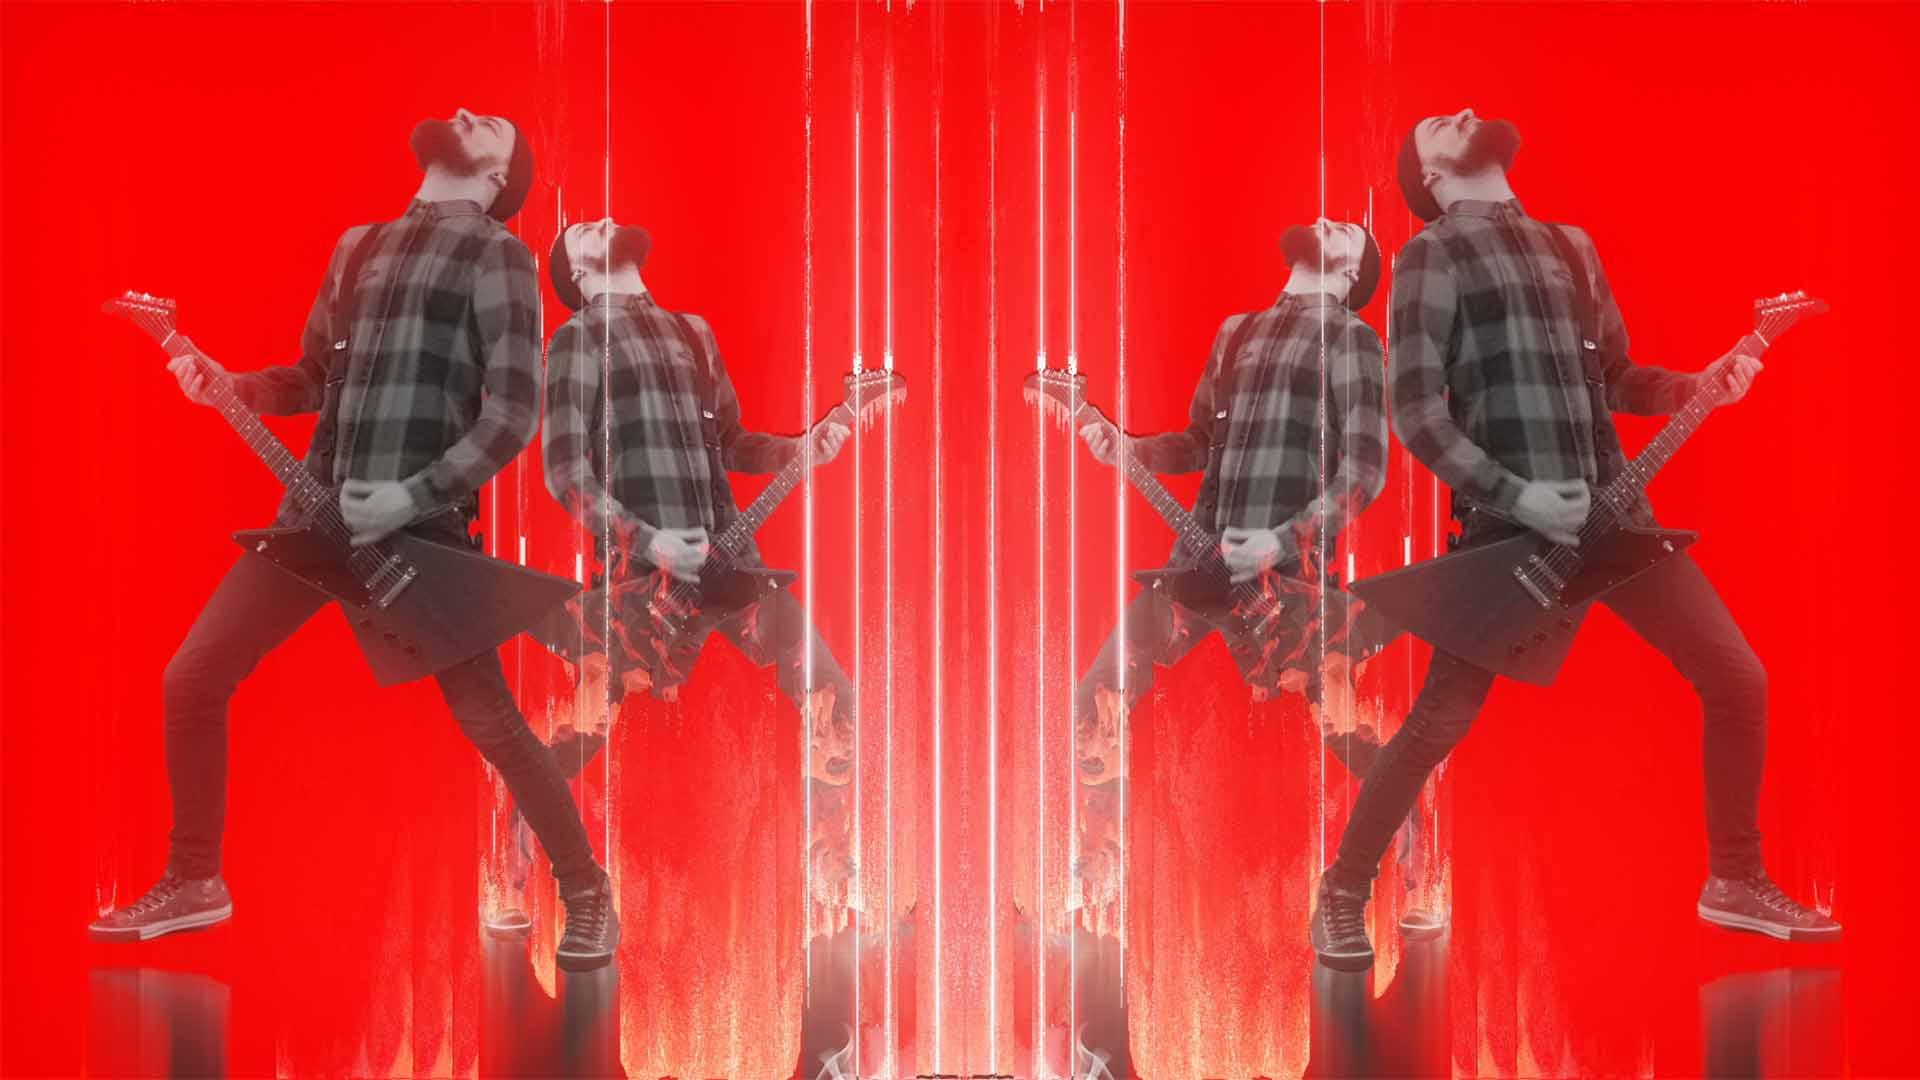 Punk Guitarist Rock VIdeo Footage